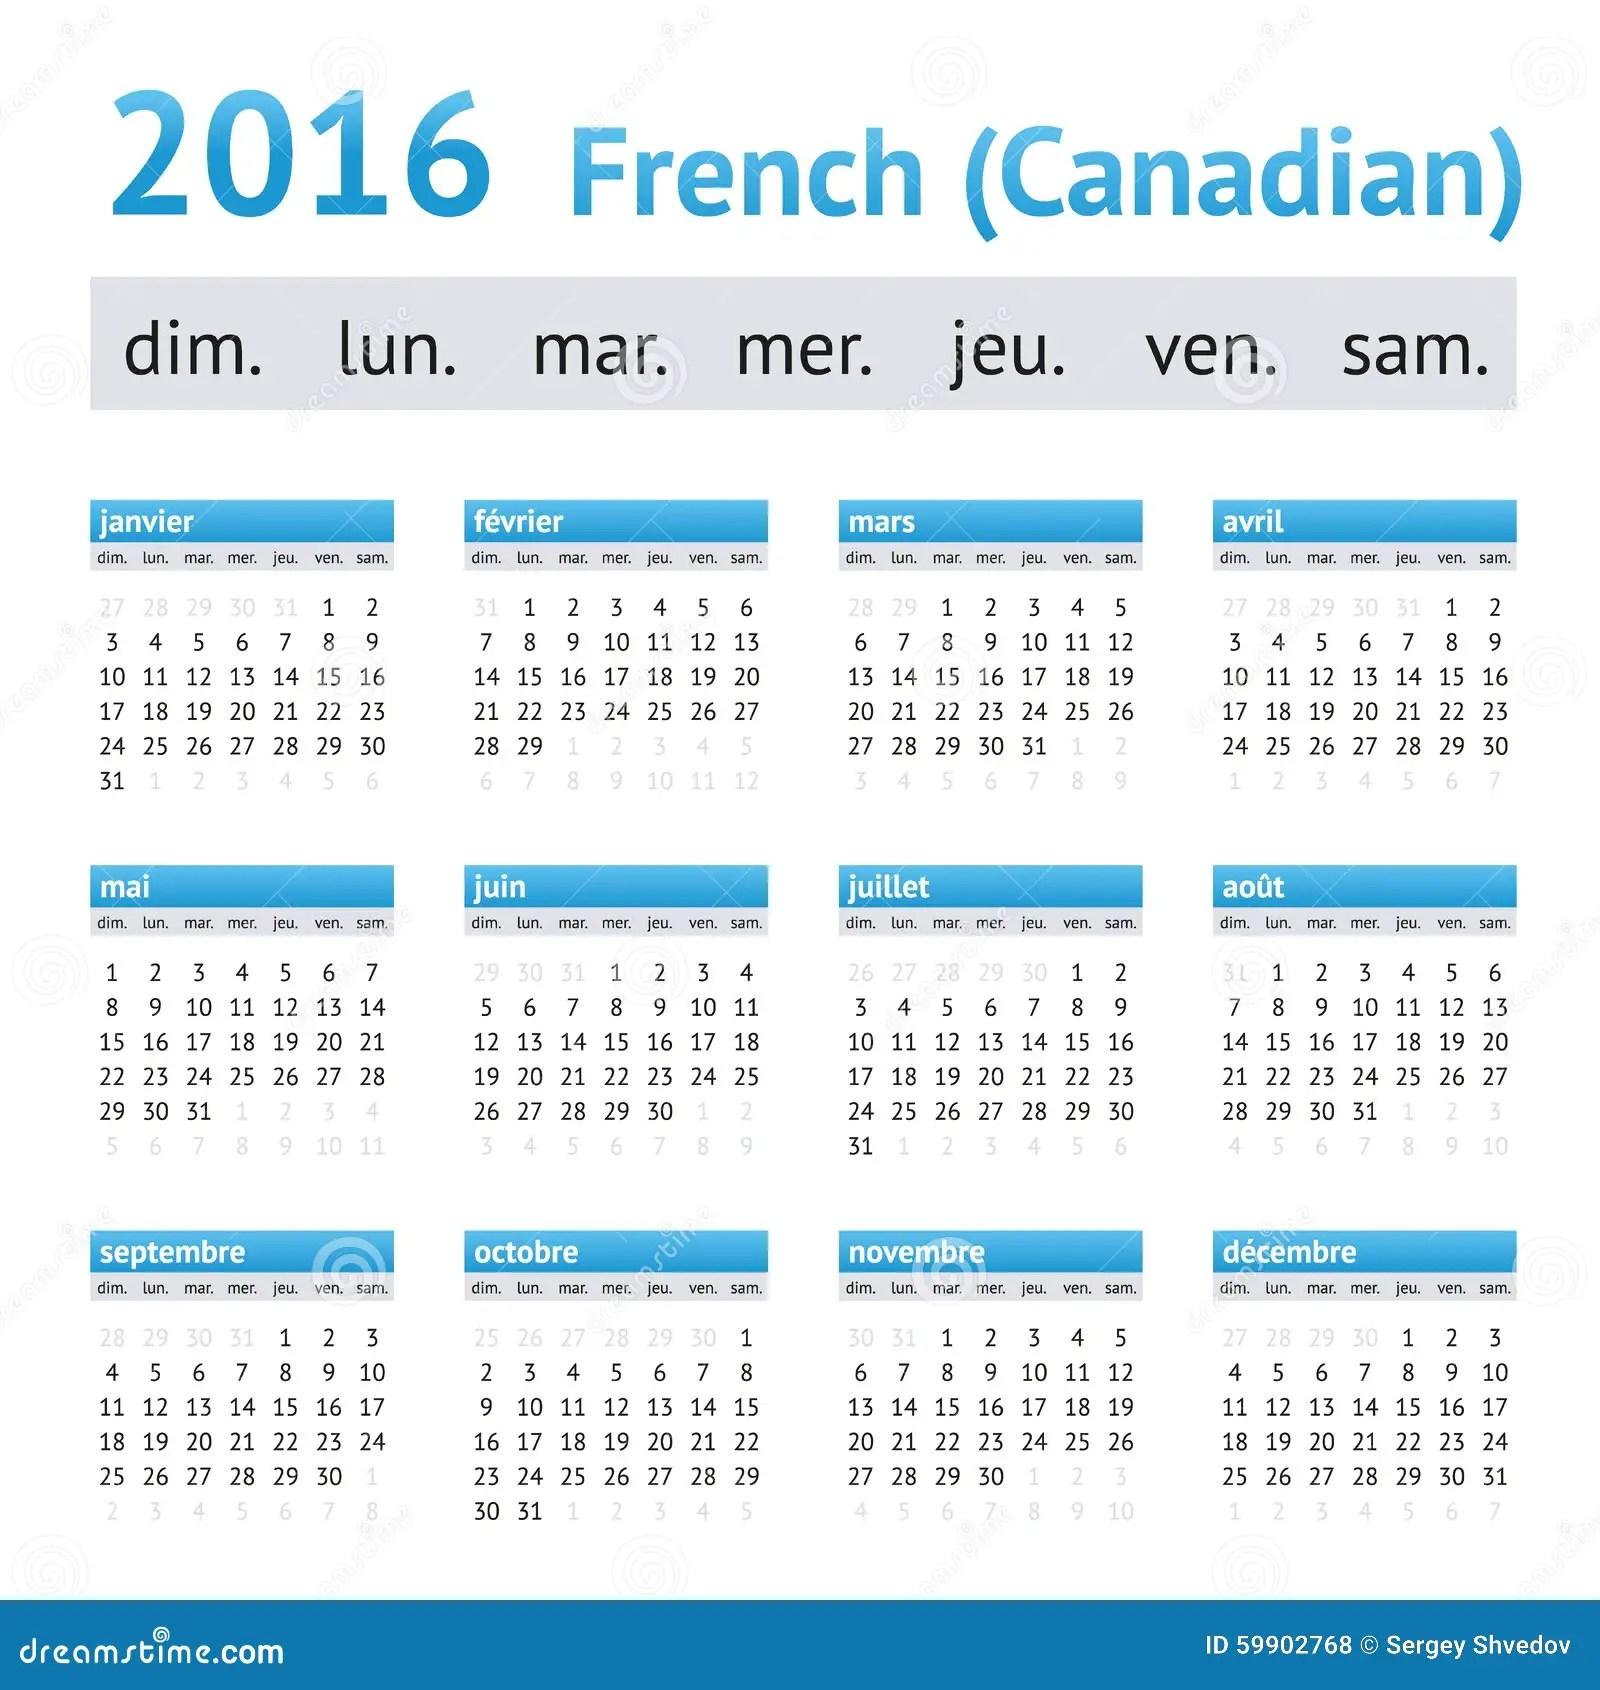 Calendar Holidays Canada 2013 2017 Holidays 2017 Calendar Of Events Teaching Ideas 2016 French American Calendar Week Starts On Sunday Stock